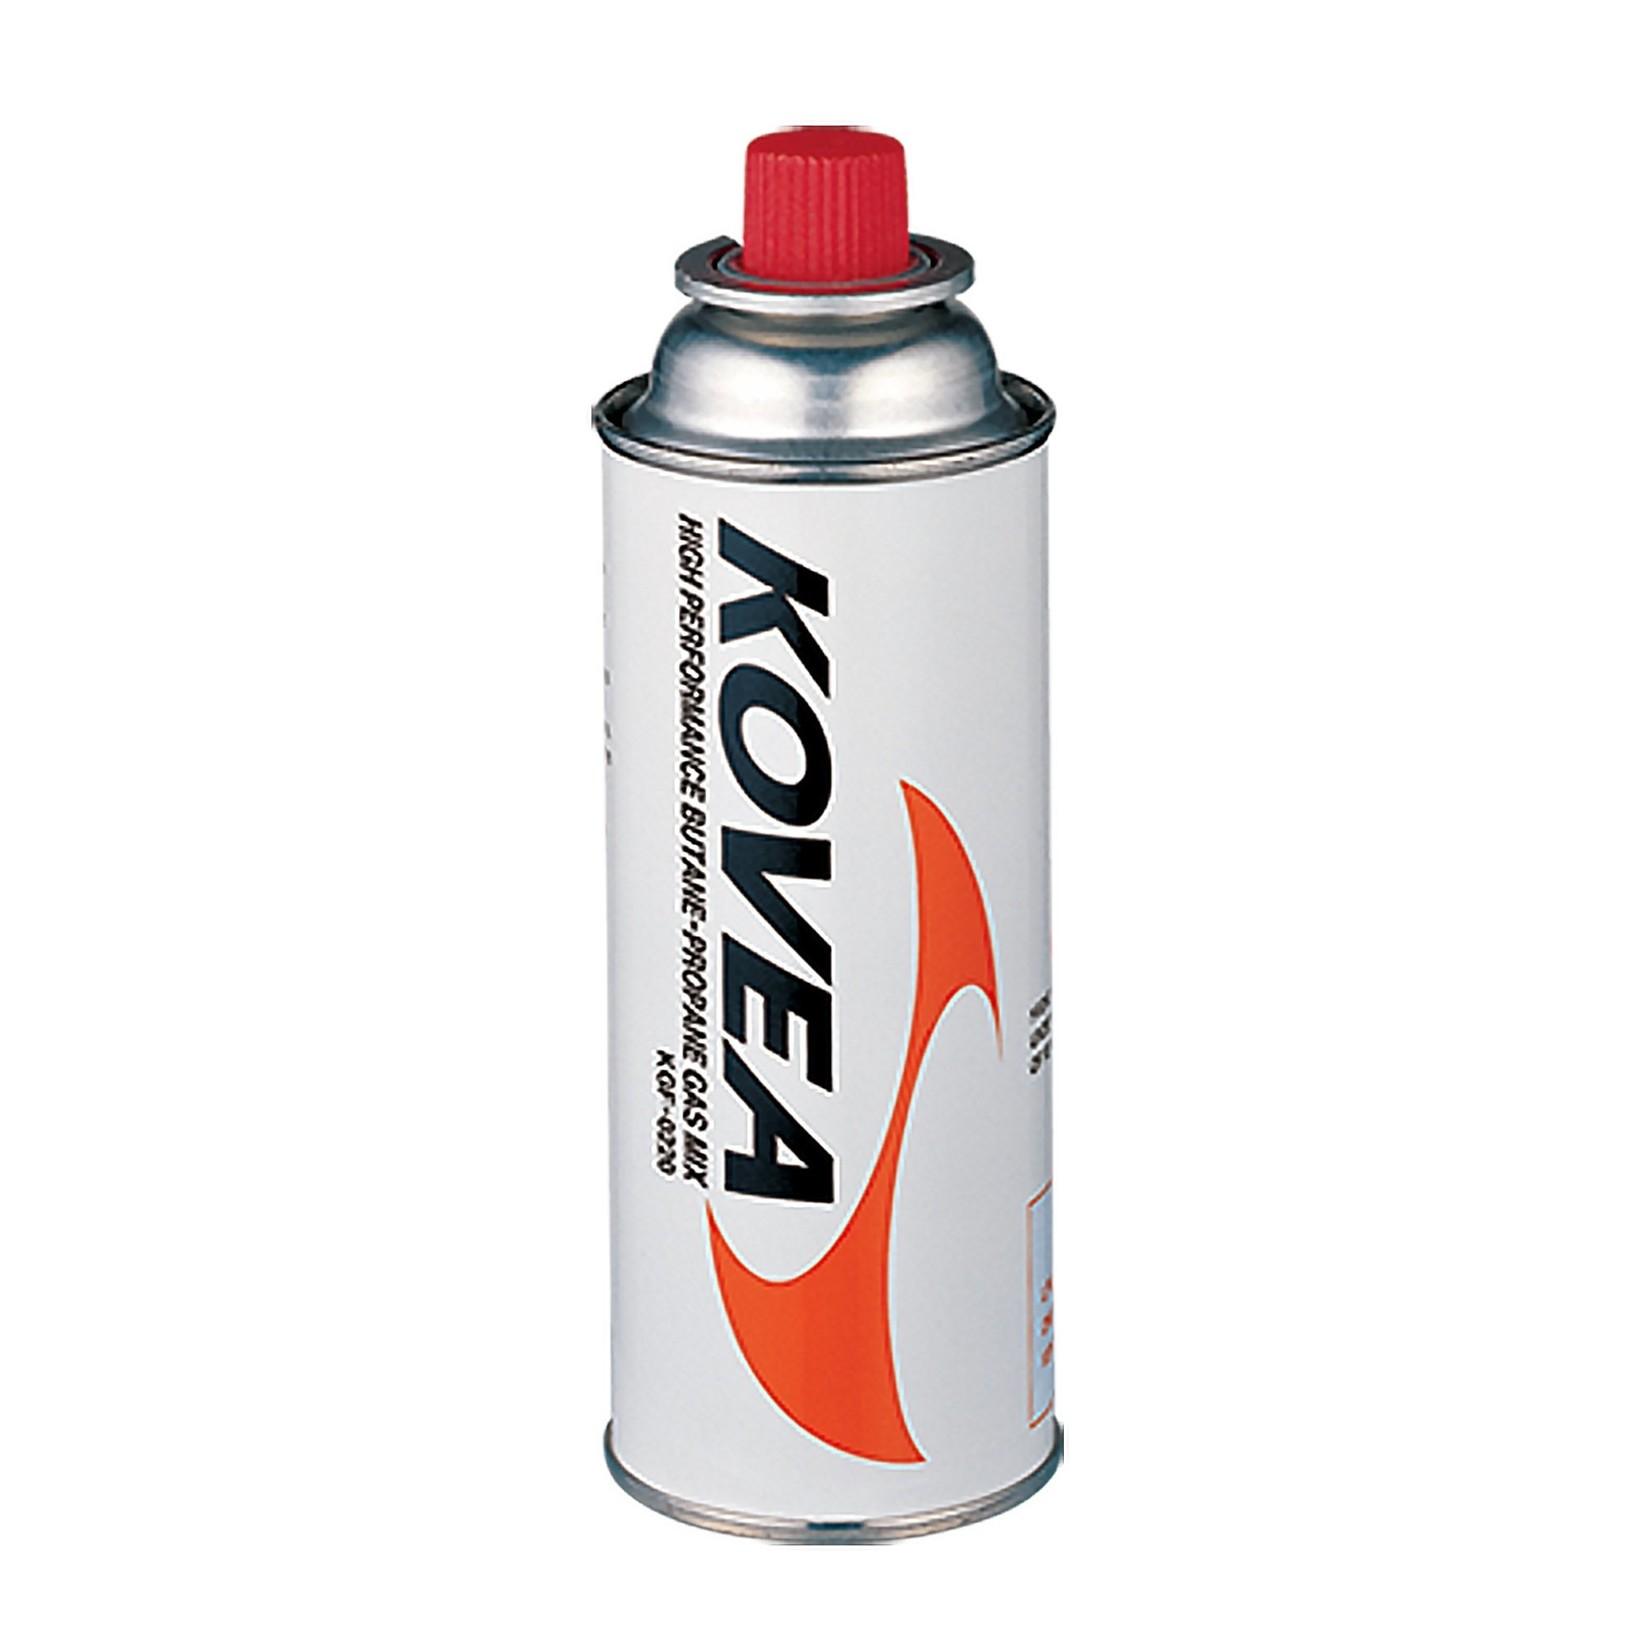 Kovea Kovea 227g Nozzle Style Butane Gas Canister